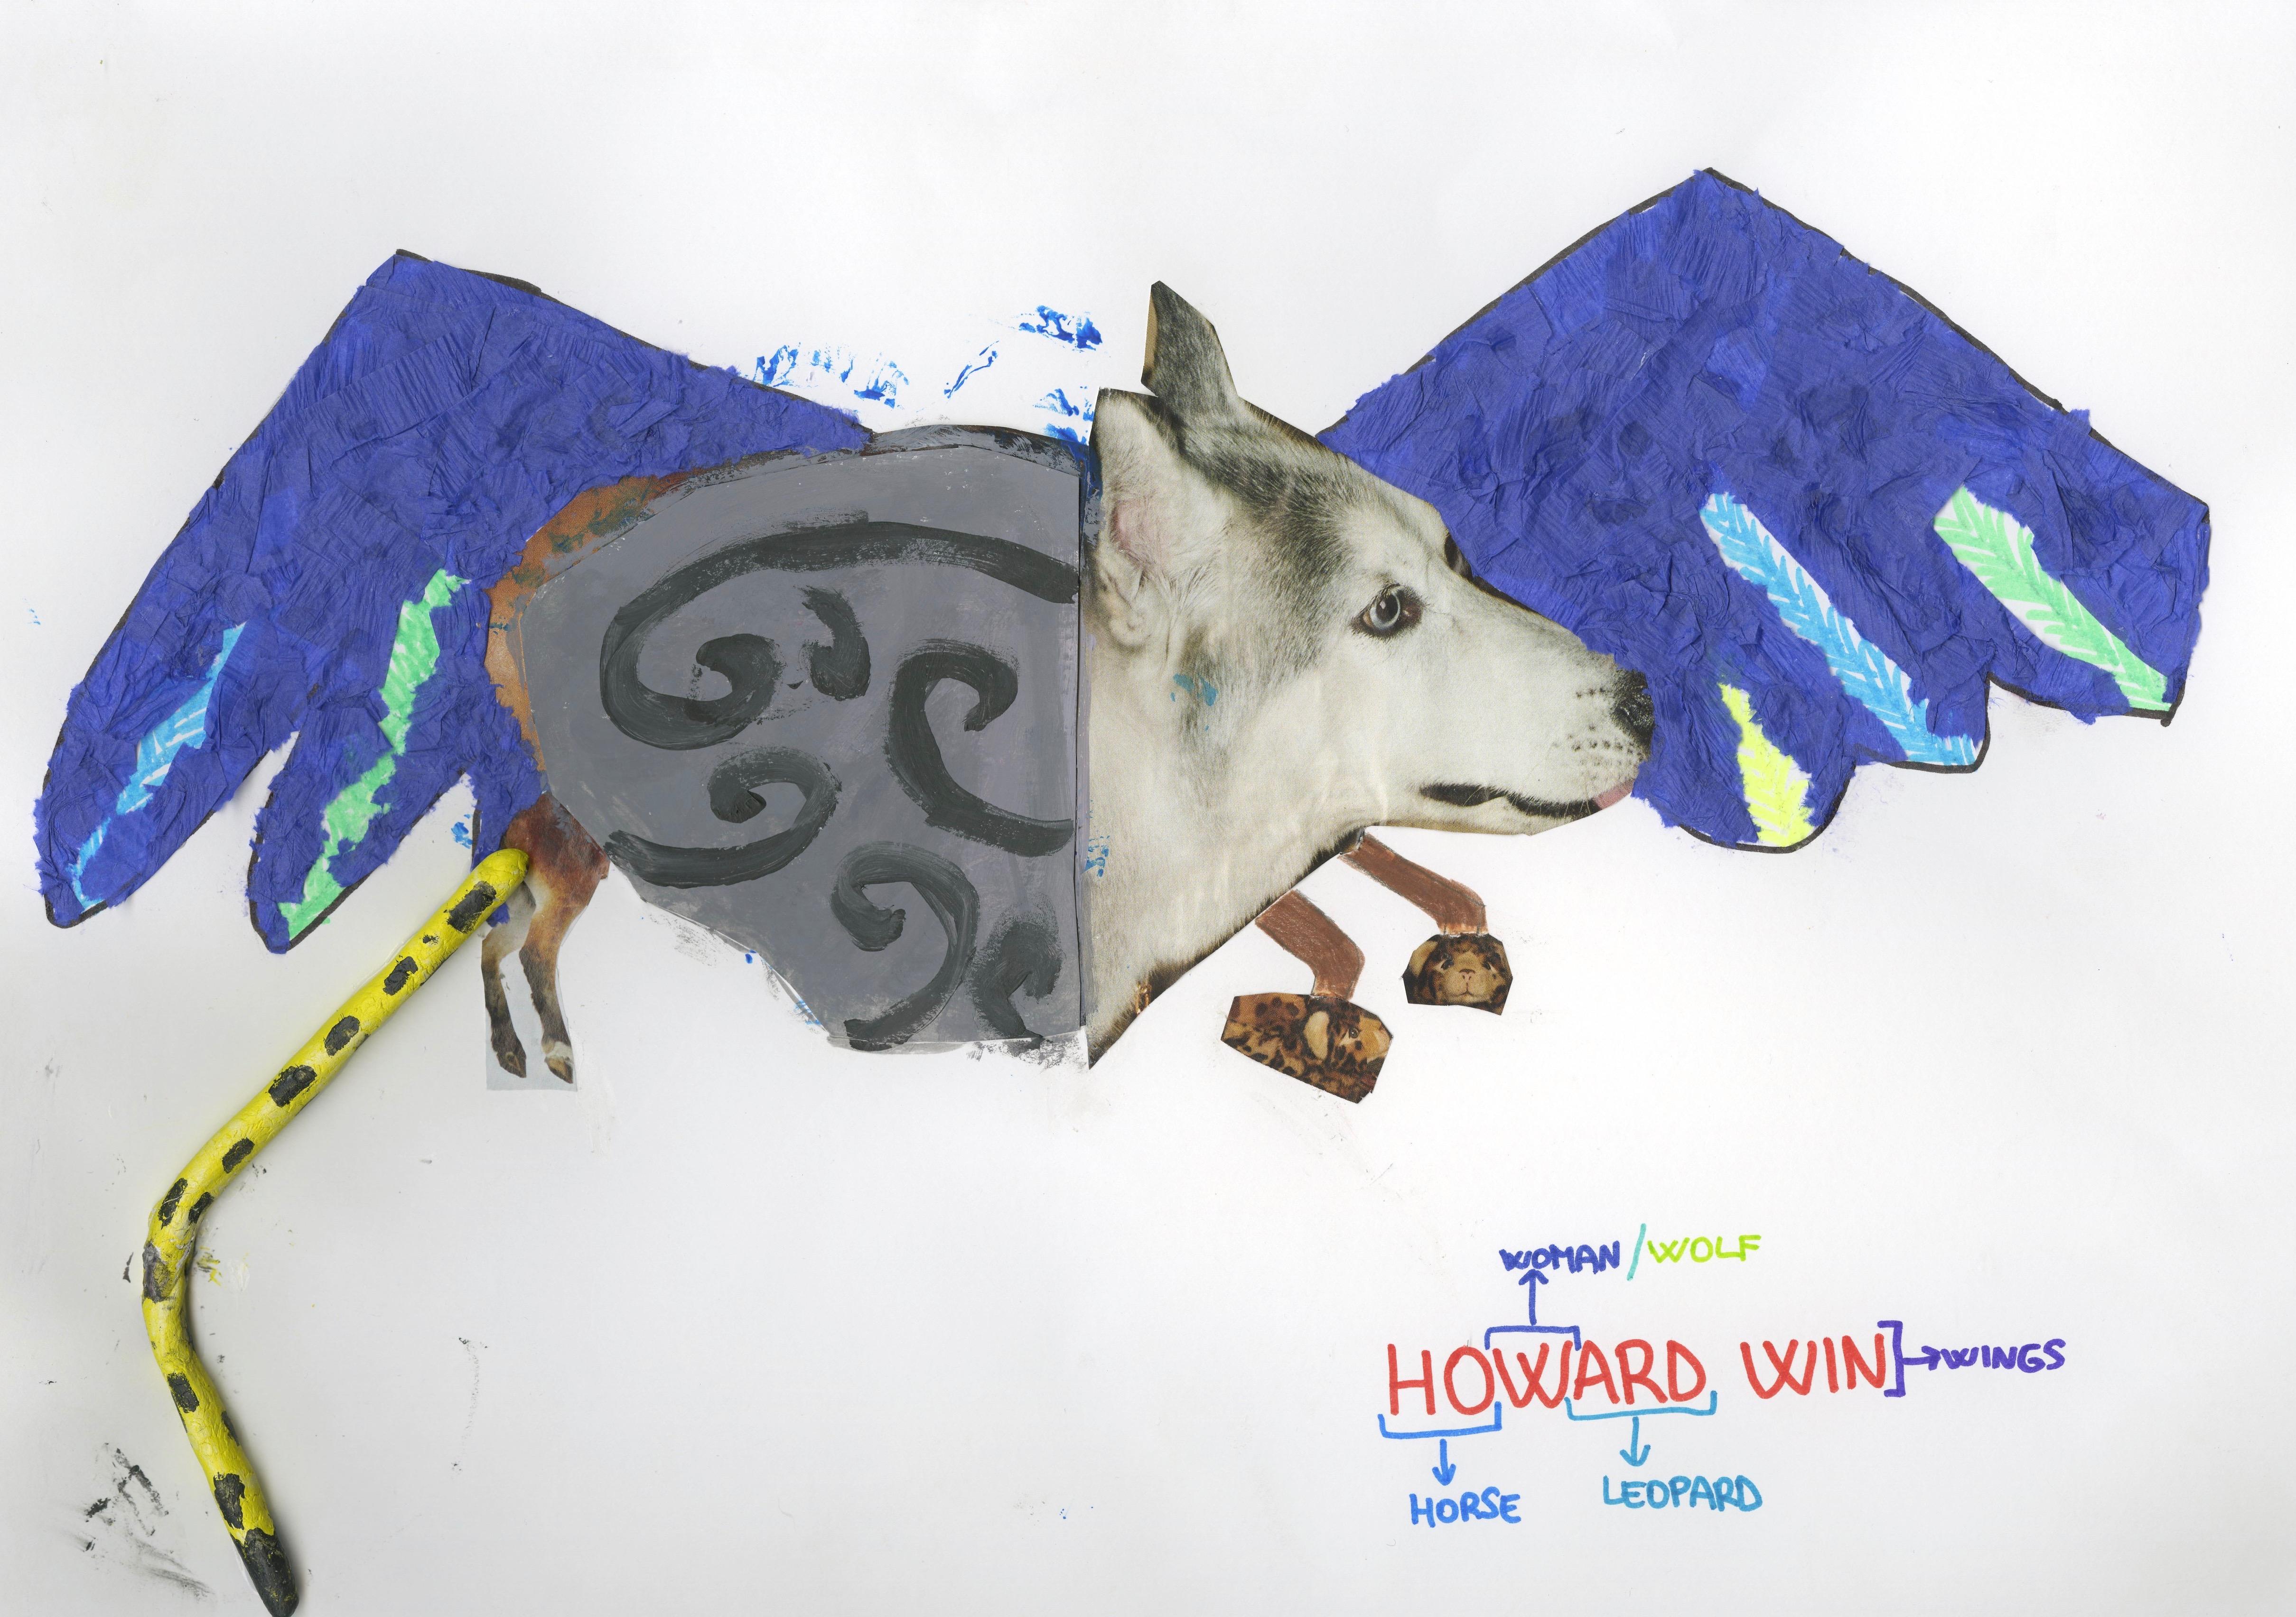 Imaginary Hybrid Animal